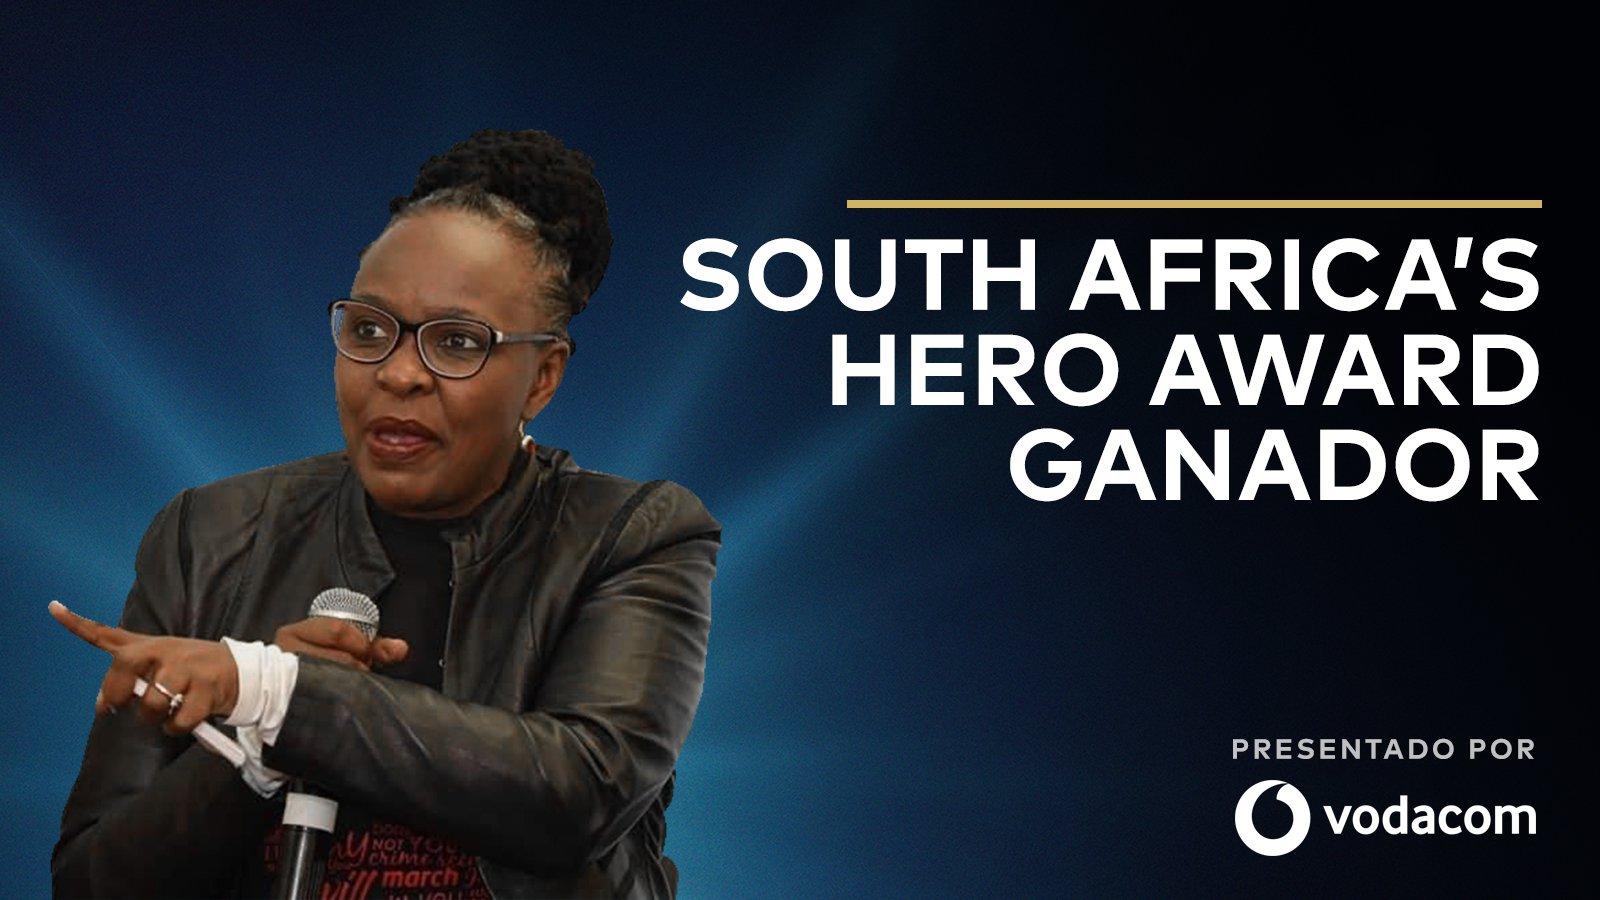 South Africa's Hero Award